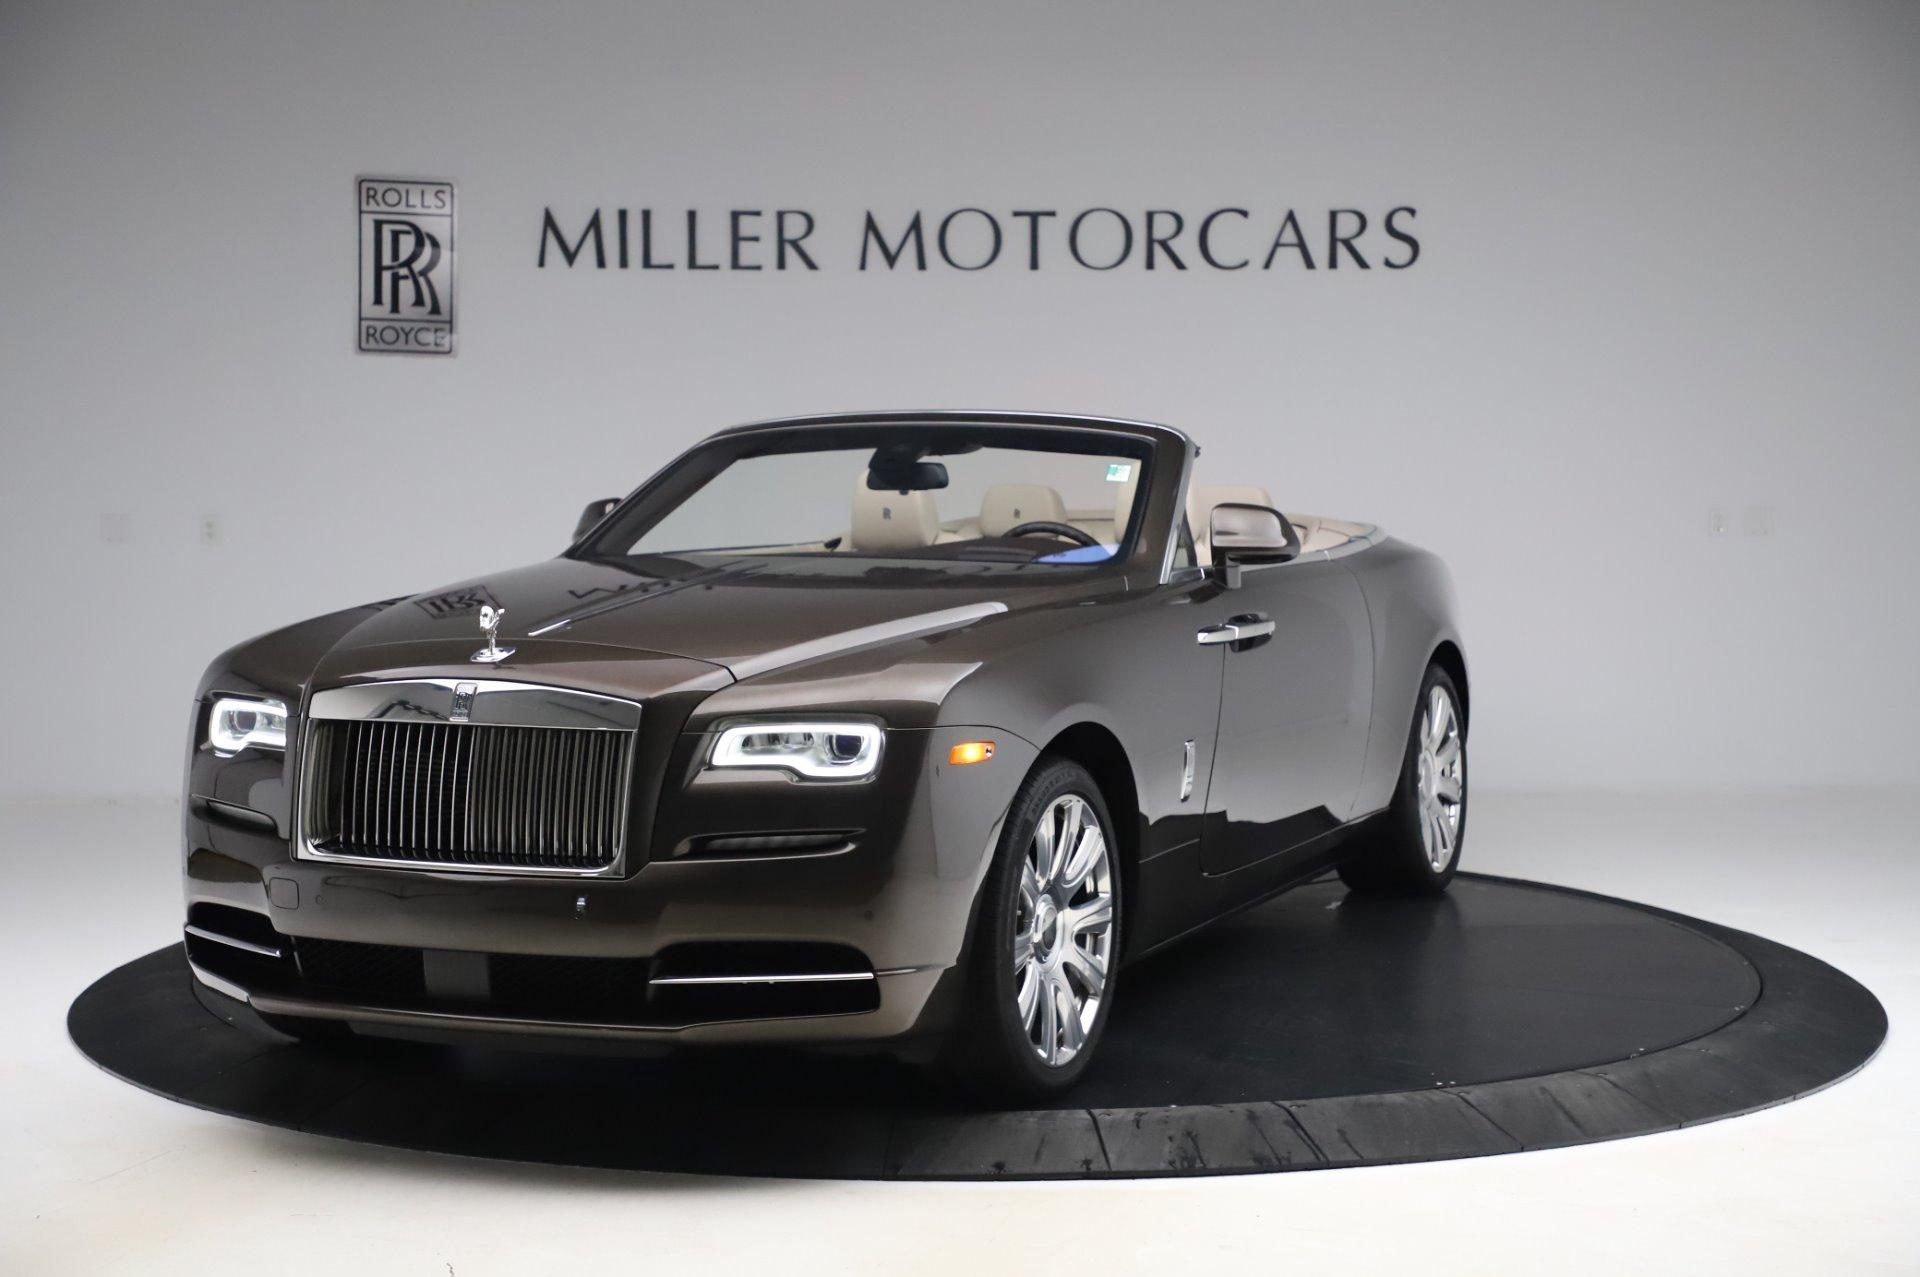 Used 2017 Rolls-Royce Dawn for sale $254,900 at Bugatti of Greenwich in Greenwich CT 06830 1